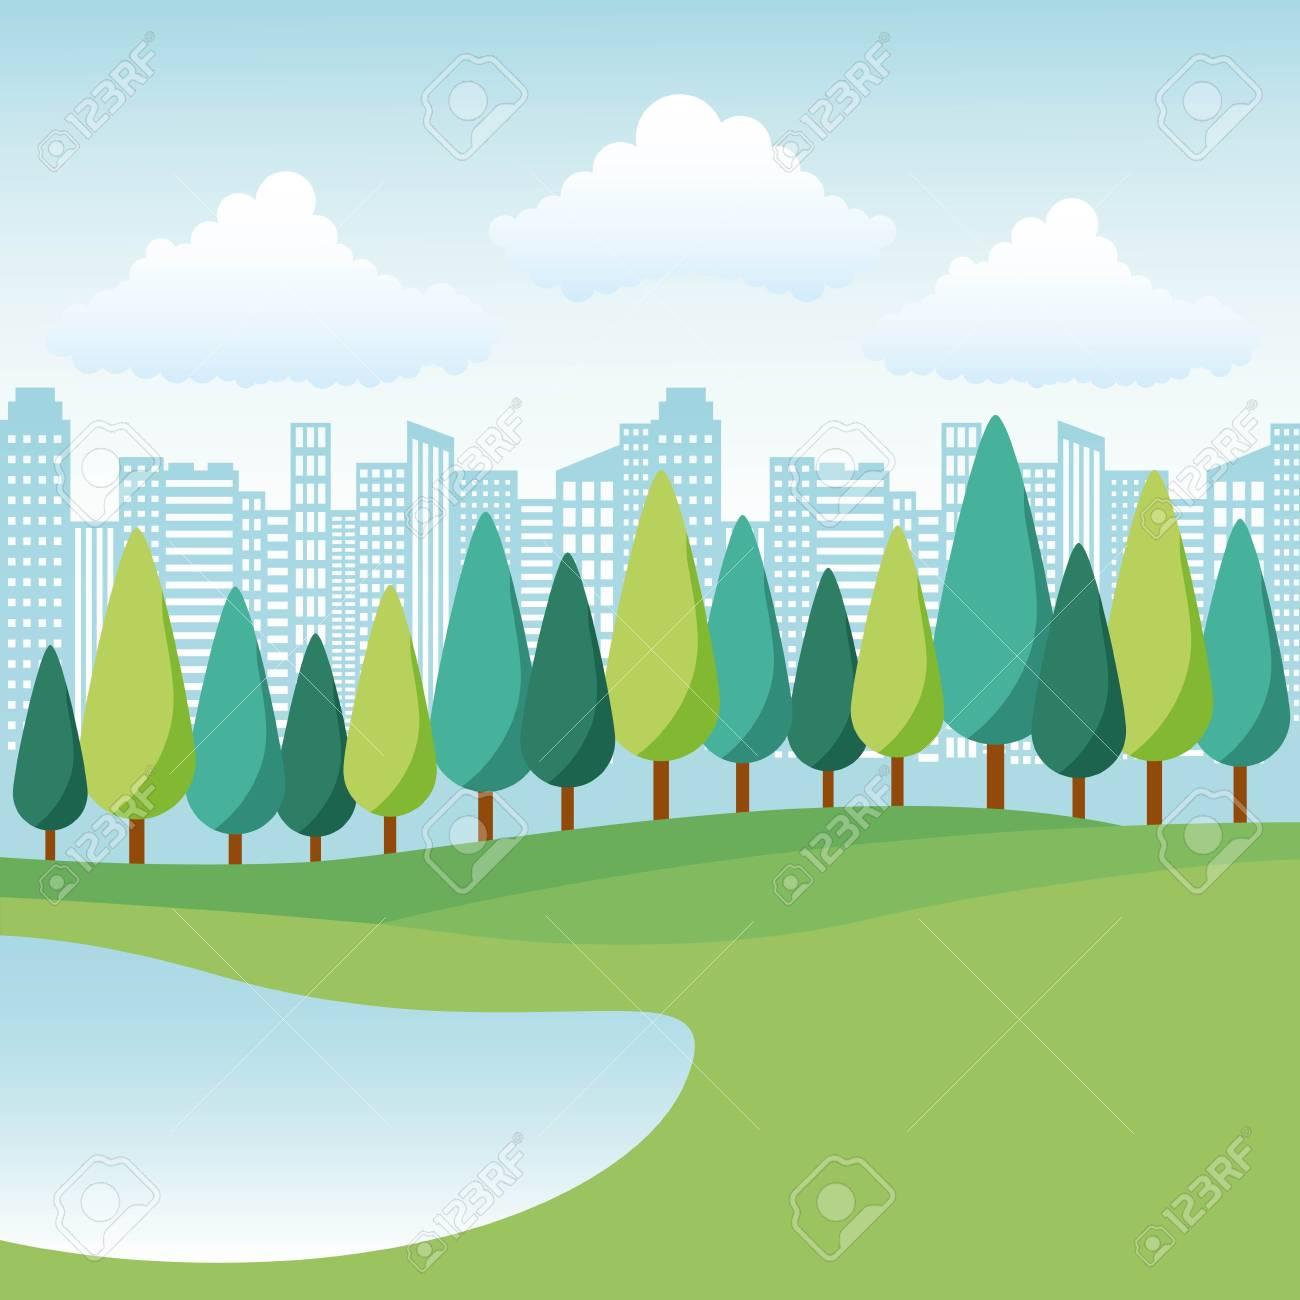 natural park lake trees and city landscape vector illustration - 112326758